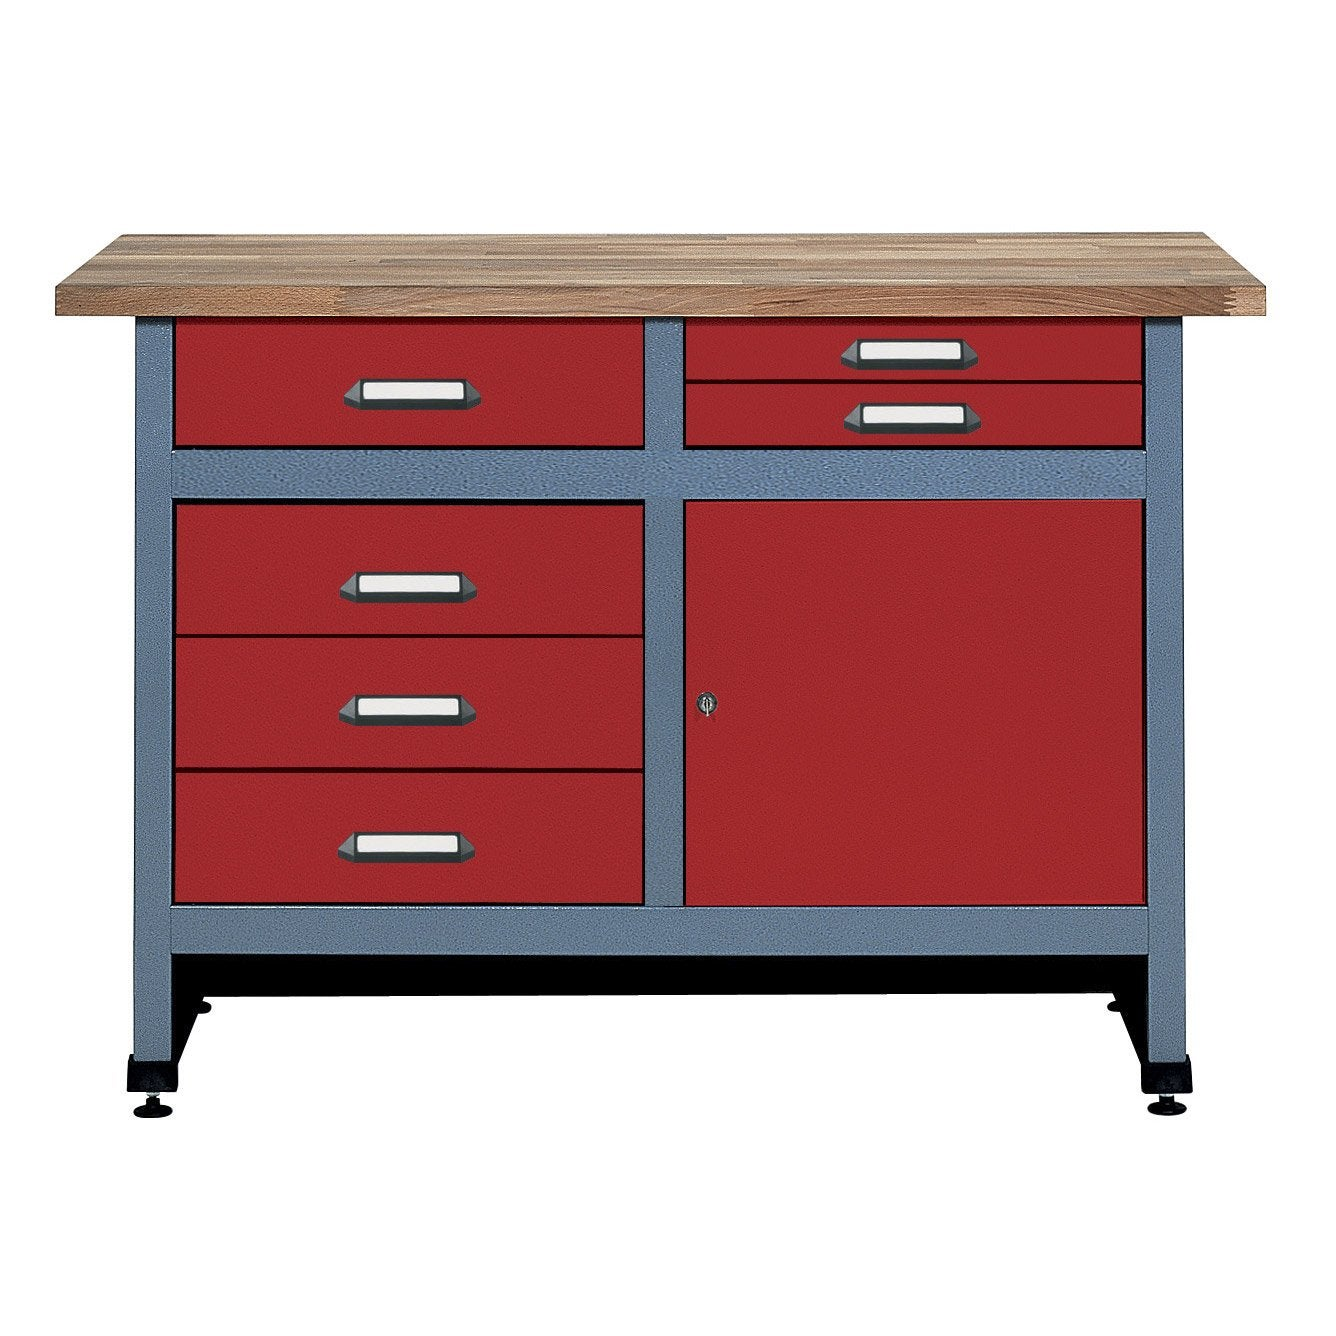 etabli de m canicien kupper 120 cm 1 porte et 6 tiroirs leroy merlin. Black Bedroom Furniture Sets. Home Design Ideas